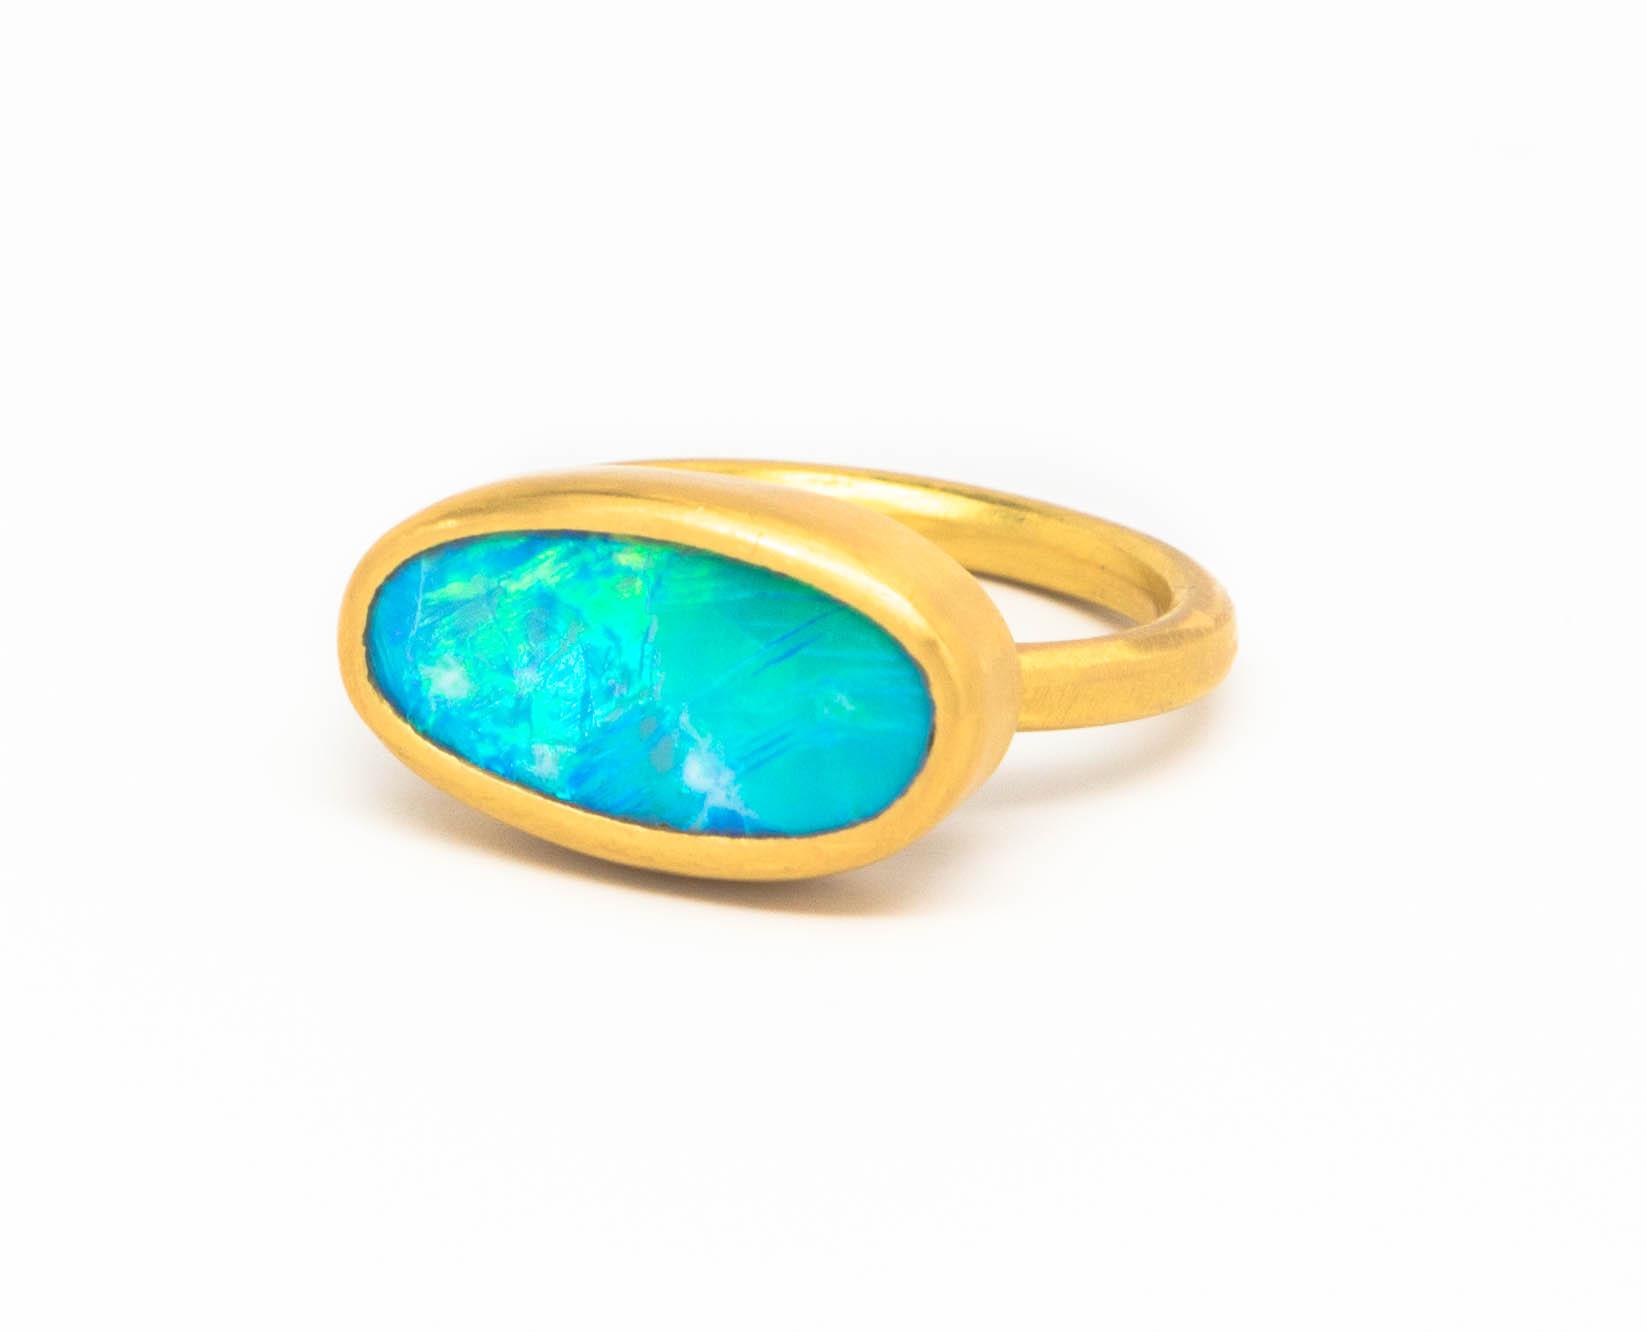 dec21 jewelry5-620.jpg